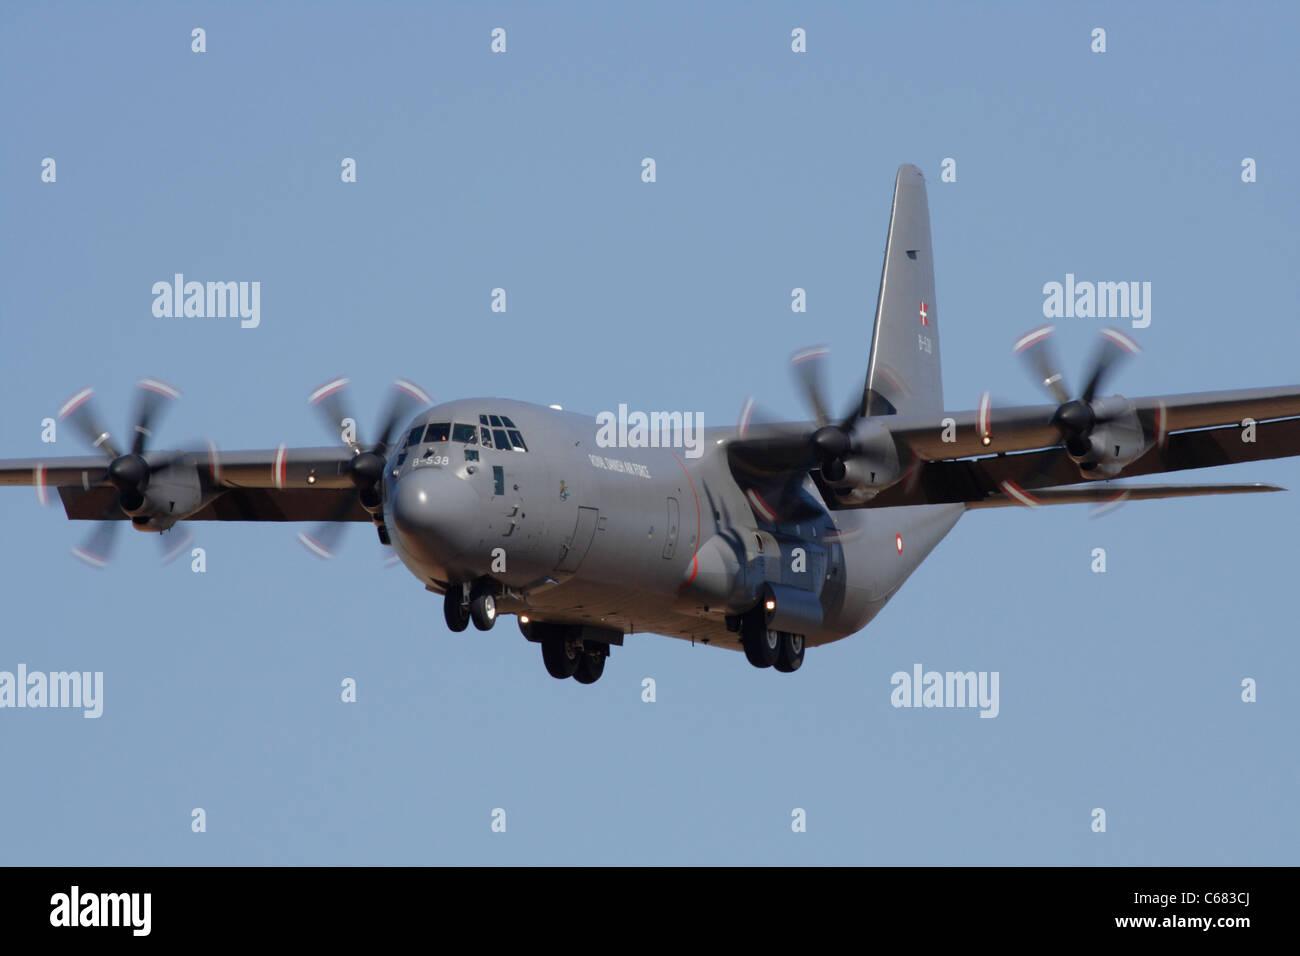 Royal Danish Air Force Lockheed Martin C-130J Hercules four-engine turboprop military transport plane. Close up - Stock Image